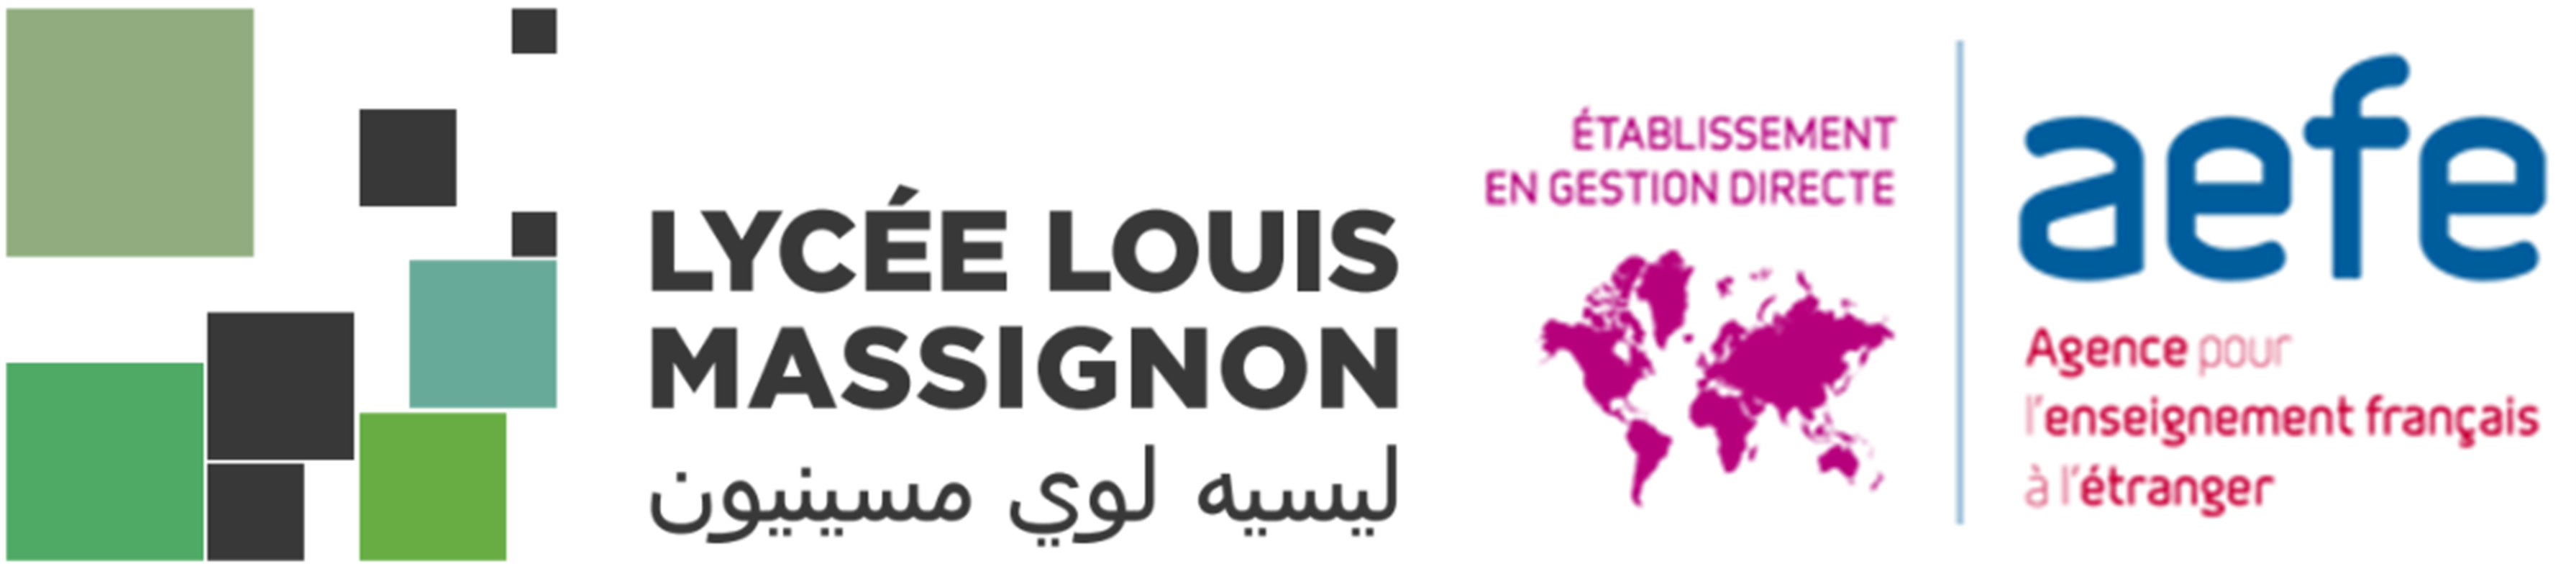 Lycee Louis Massignon